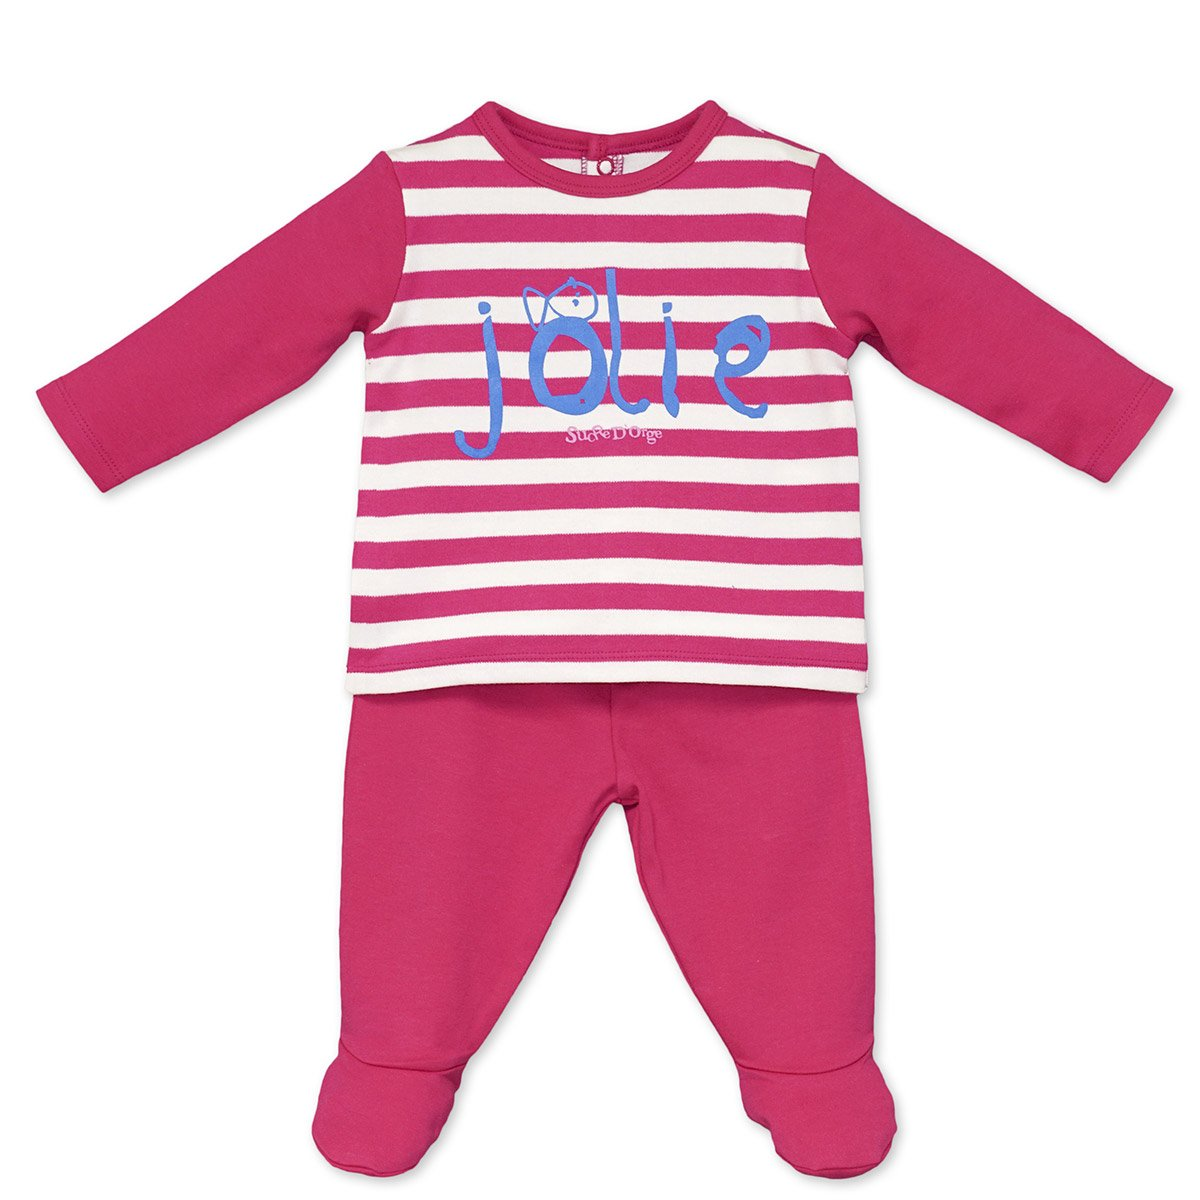 Sucre D'Orge - sleepwear - Féminin - 1 - pyjama 2 pieces fuchsia - Taille 6 Mois - Couleur Rose Sucre D' Orge 3512044043686